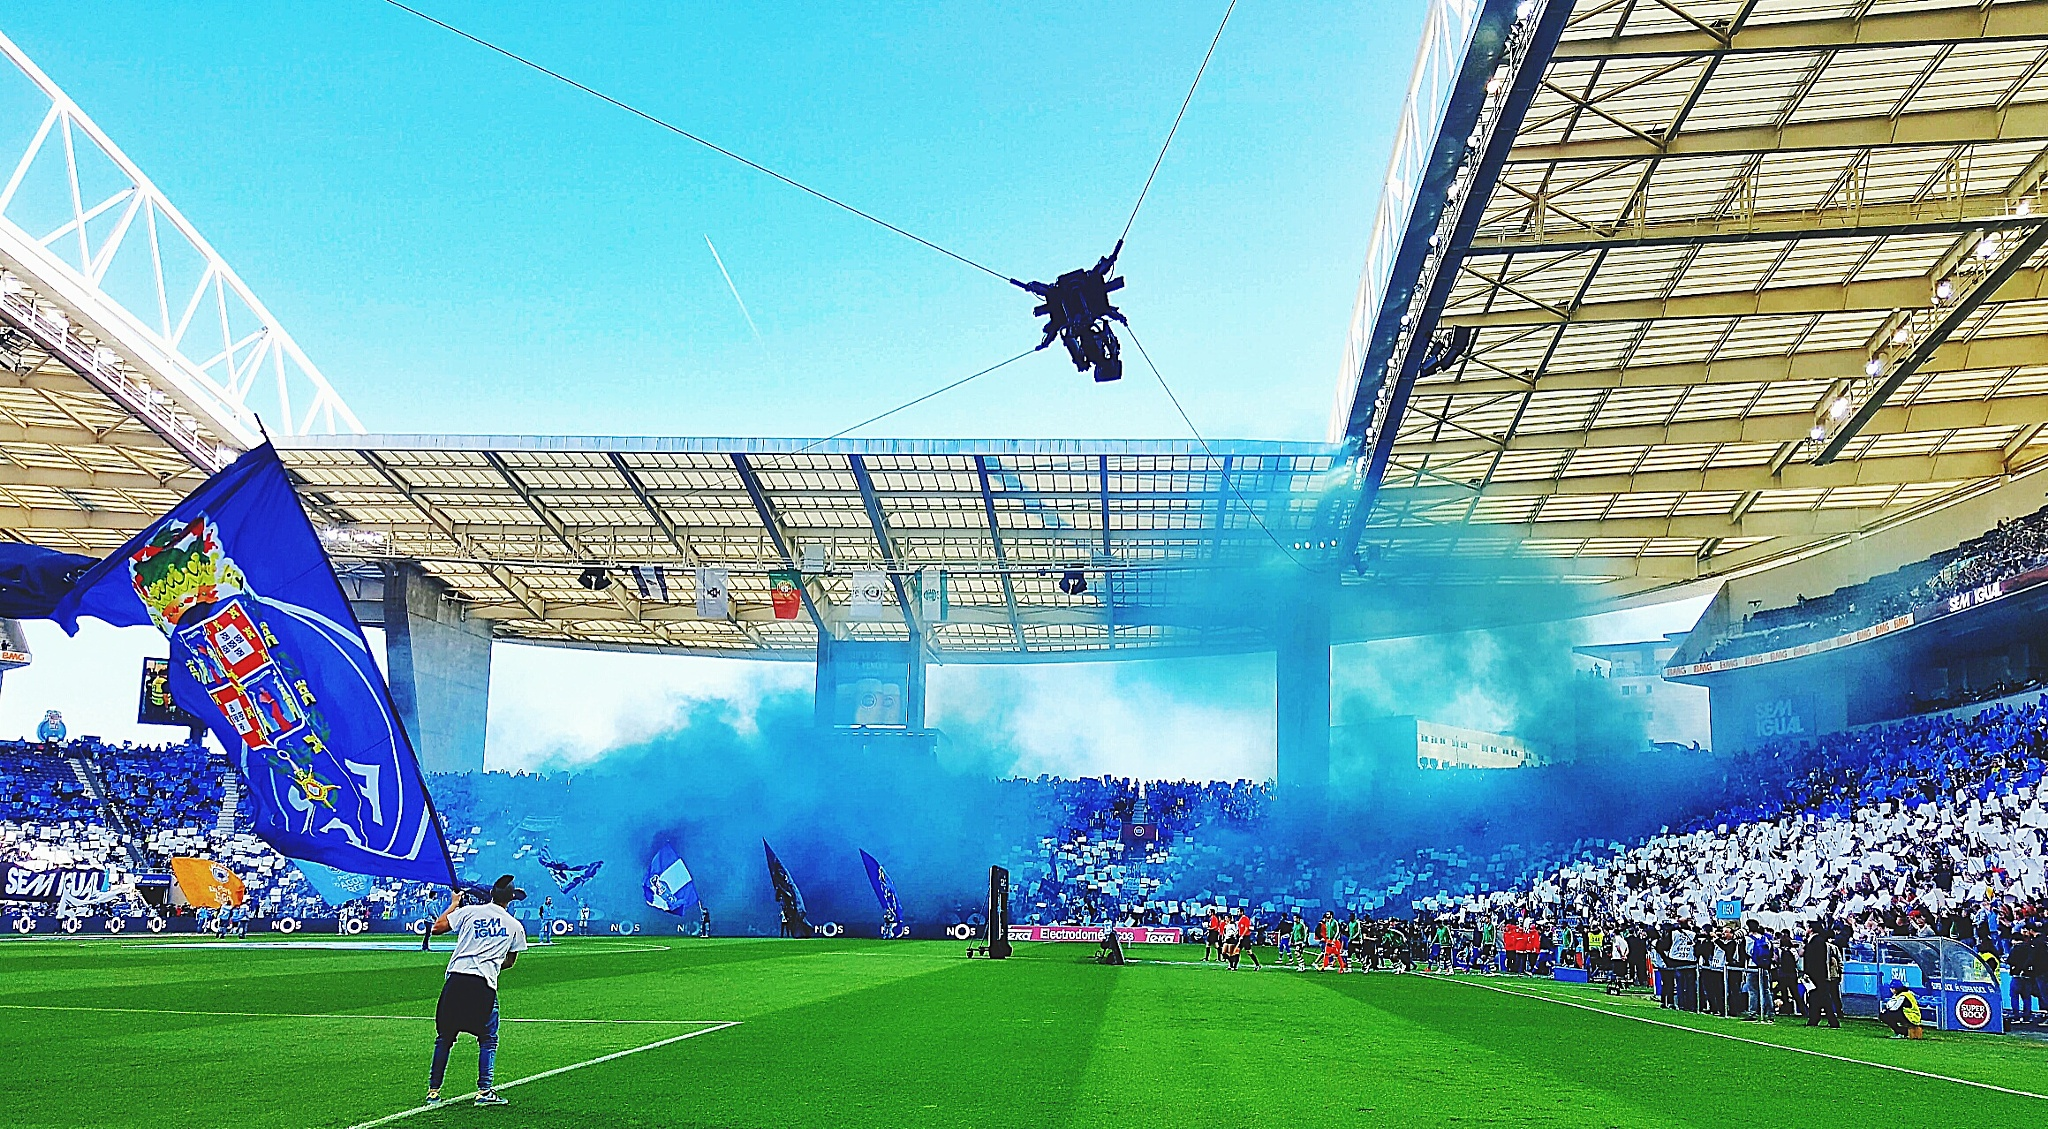 final match of the season by Sergio Ramos